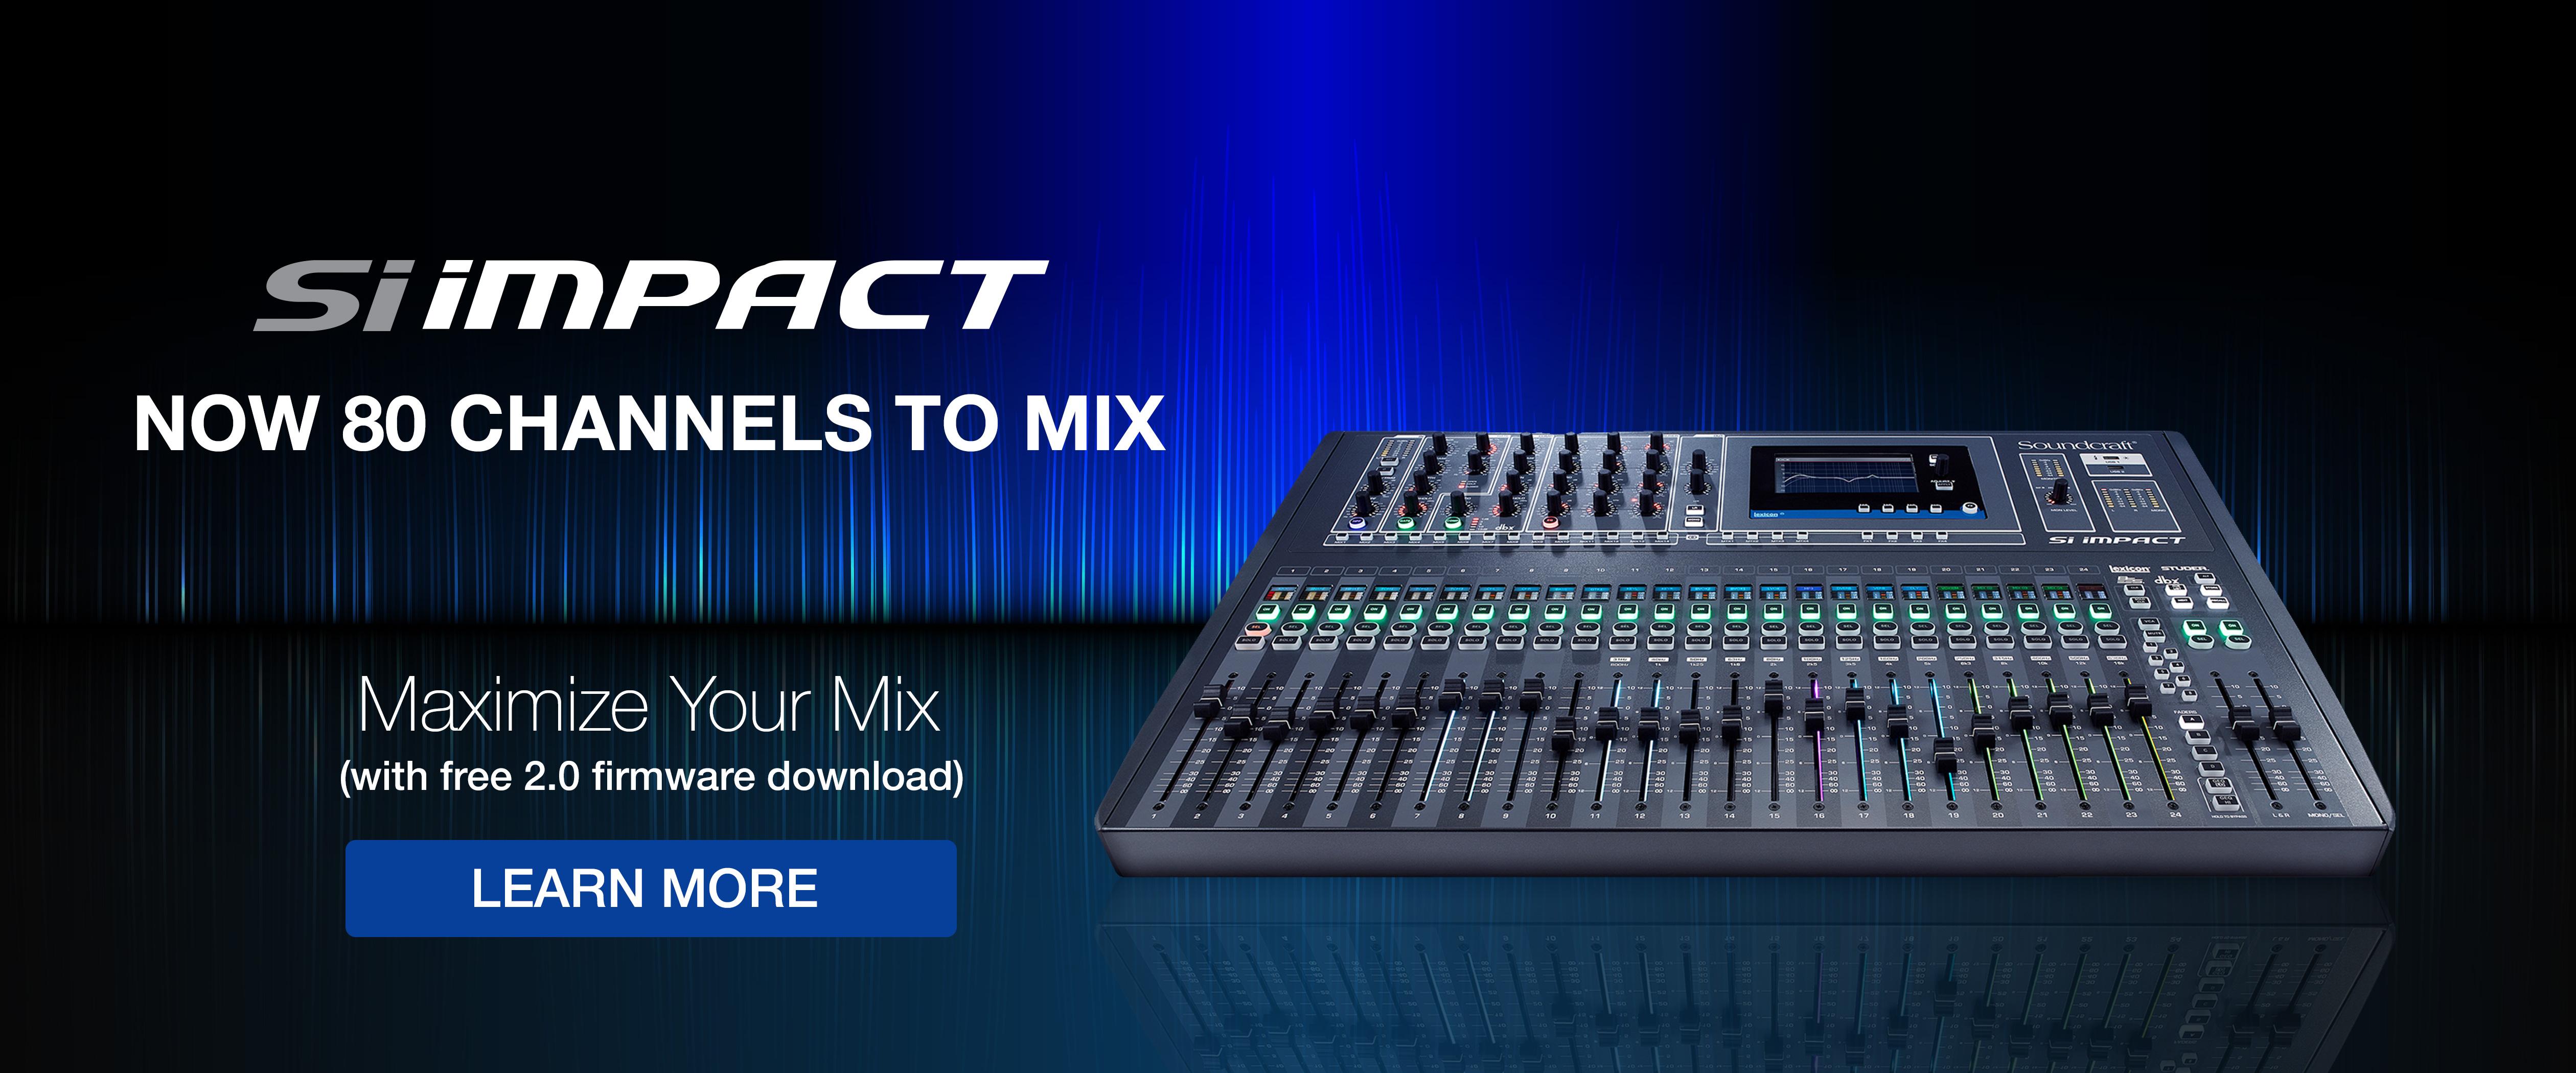 Soundcraft siimpact firmwareupdate homepagebanner 5040x2100 original